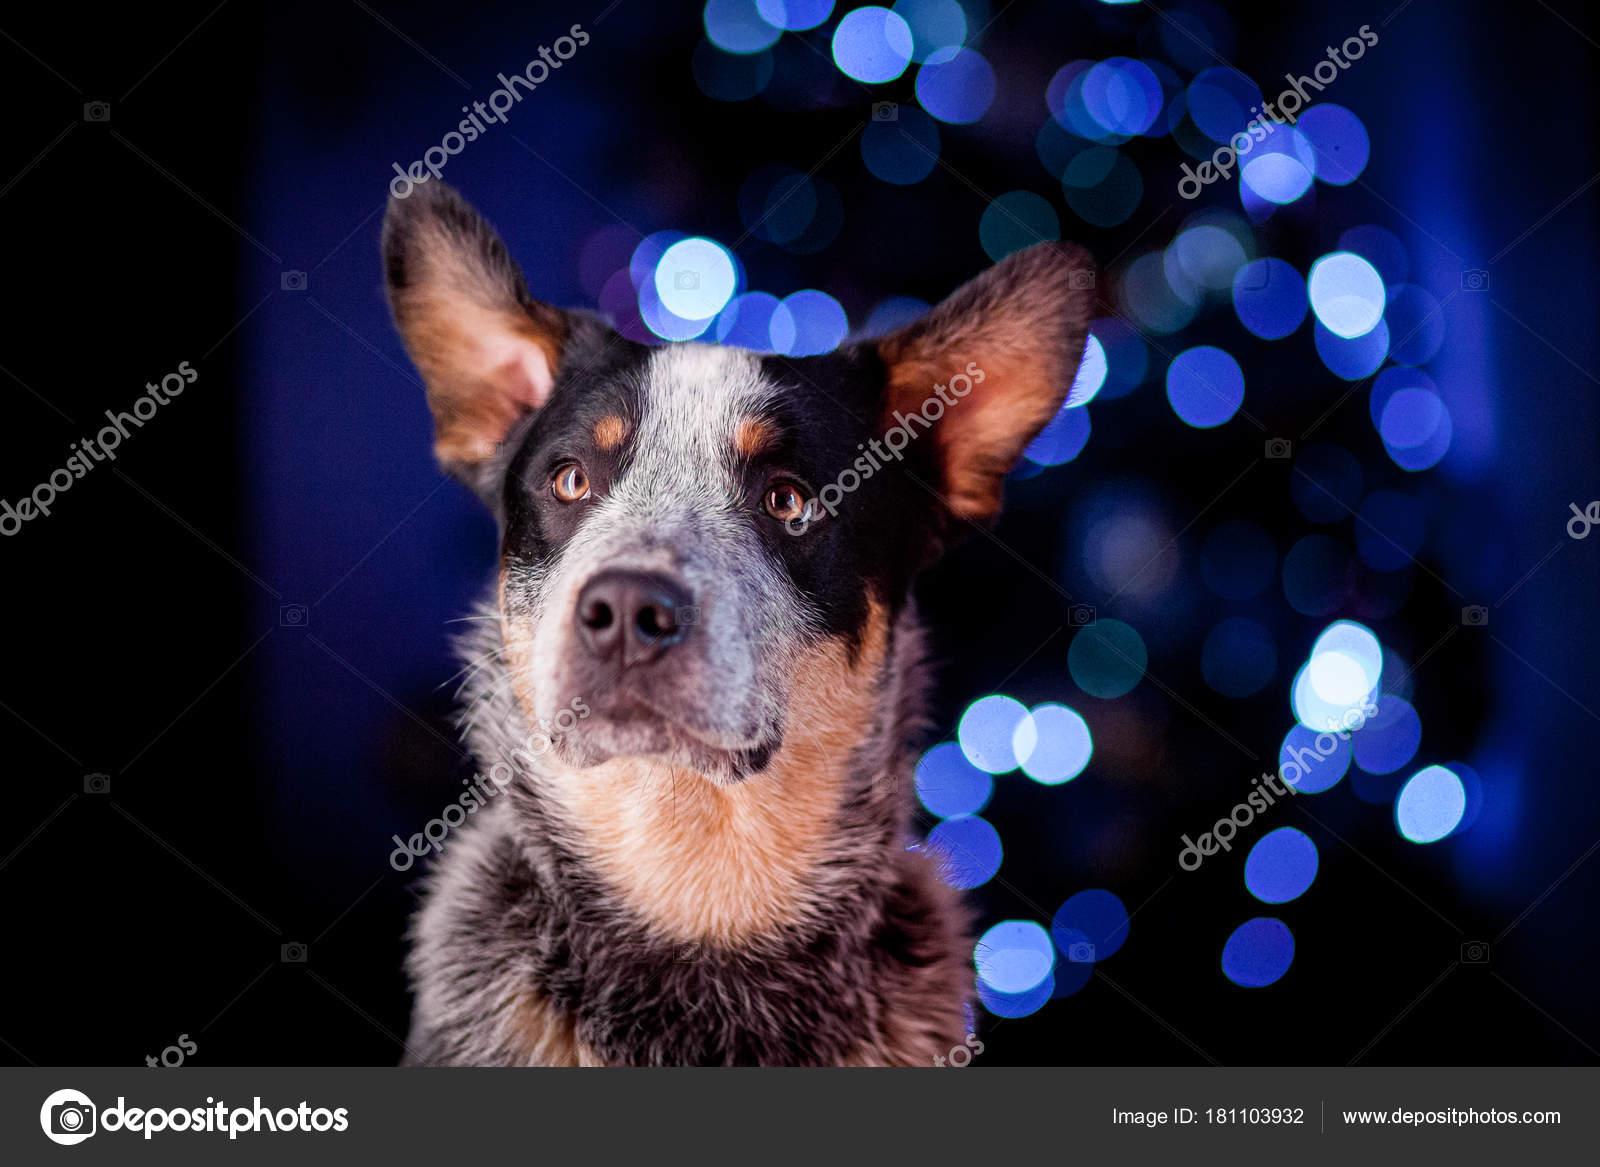 hond kerst verlichting stockfoto